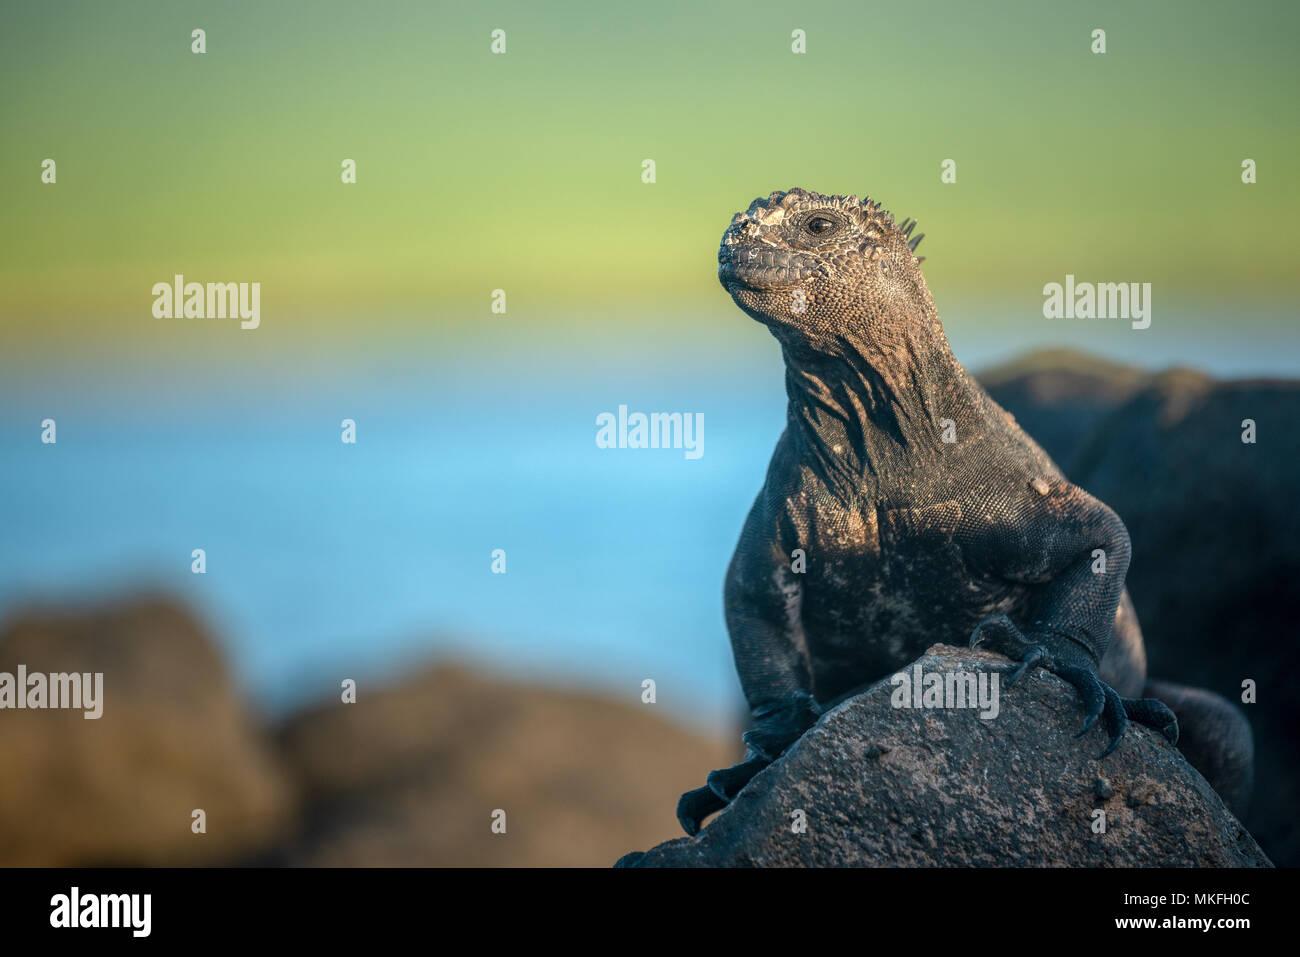 Marine iguana (Amblyrhynchus cristatus) on San Cristobal Island, Galapagos Islands, Ecuador. - Stock Image